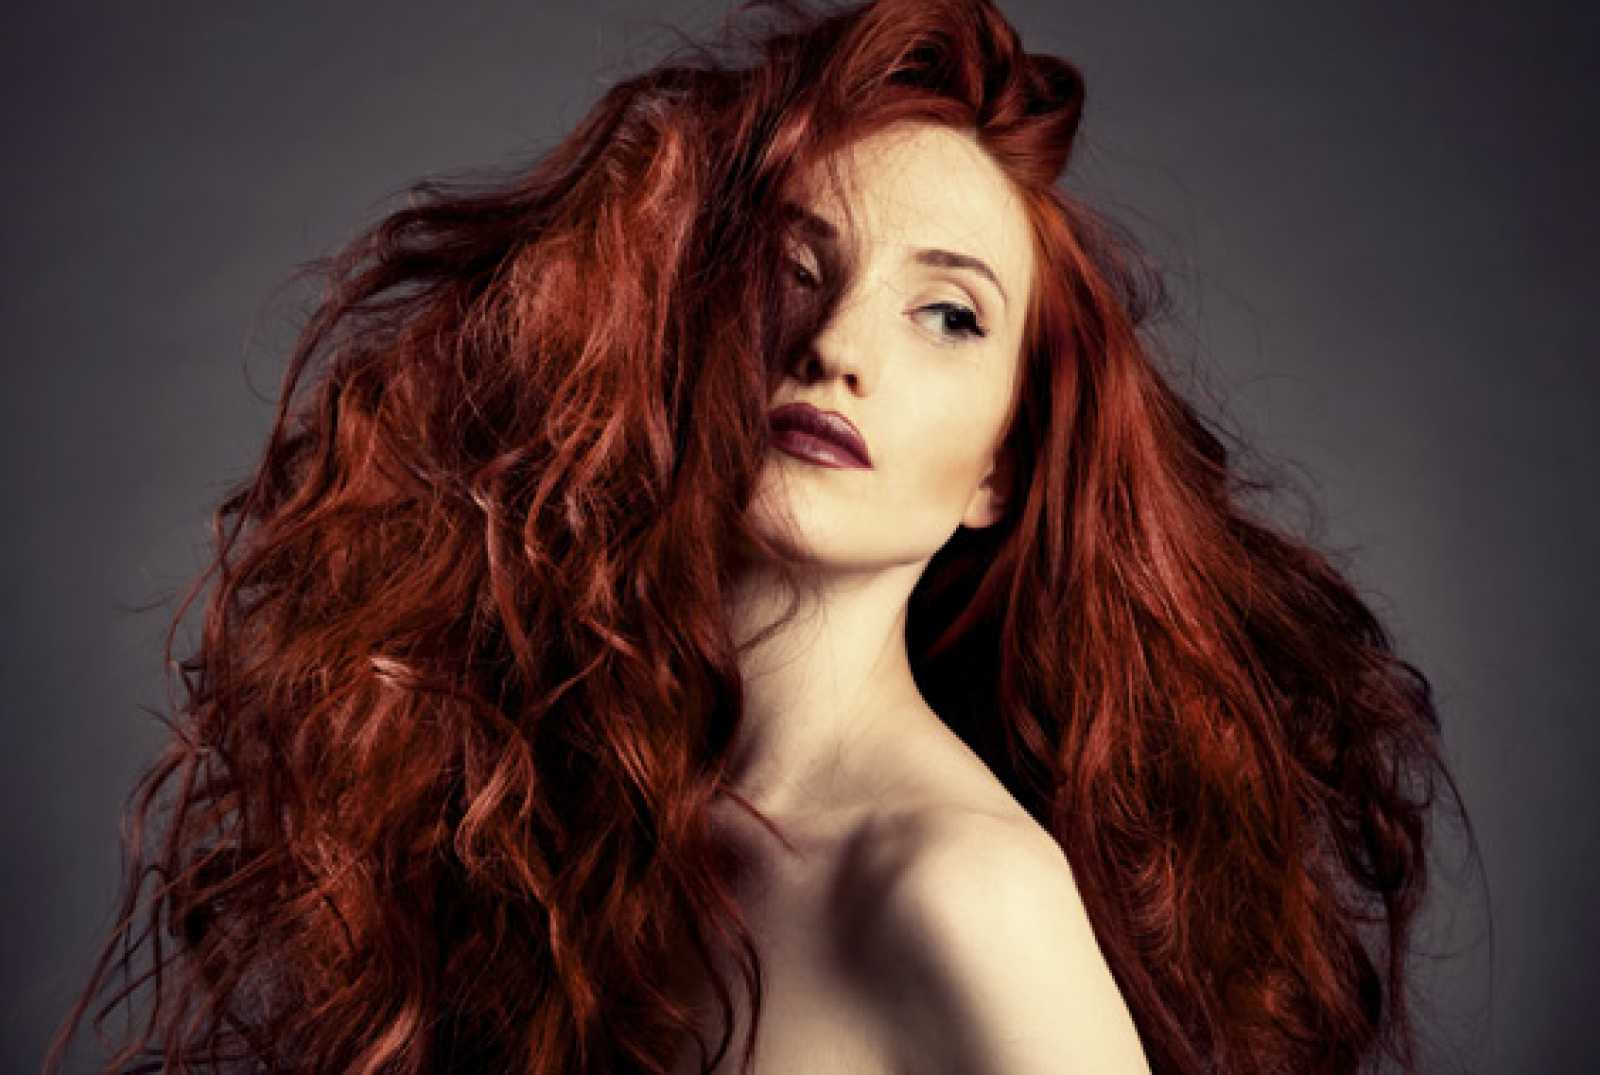 1-to-sѐ-treba-da-znae-za-svojata-kosa-sekoja-crvenokosa-devojka-www.kafepauza.mk_